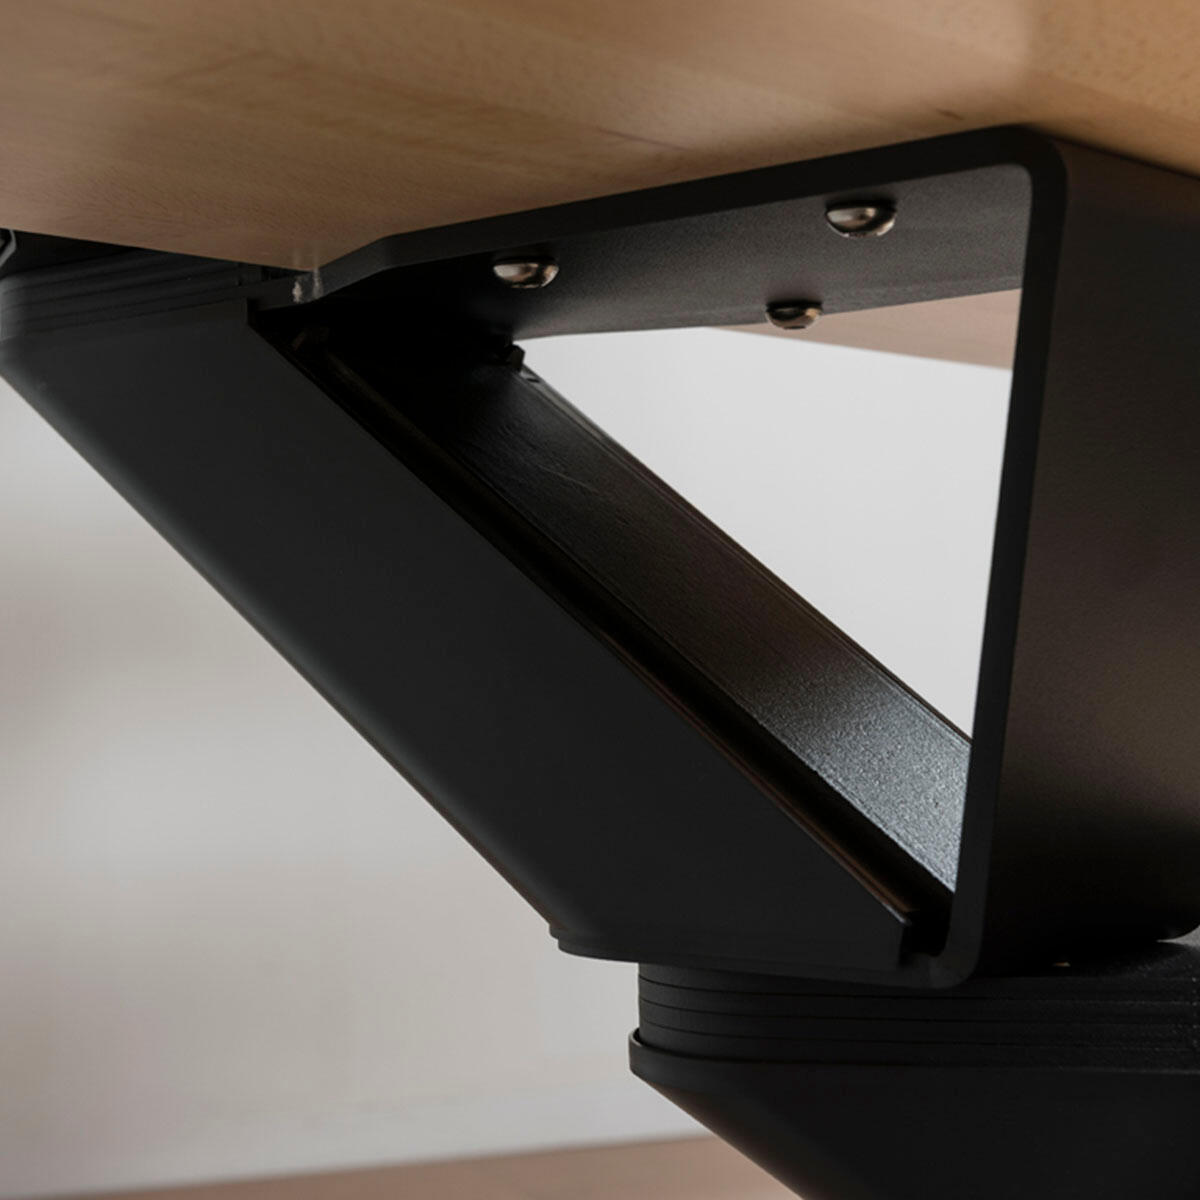 Scala a rampa 1/4 di giro Mas 050 PVC FONTANOT L 75 cm, gradino naturale, struttura nero - 3